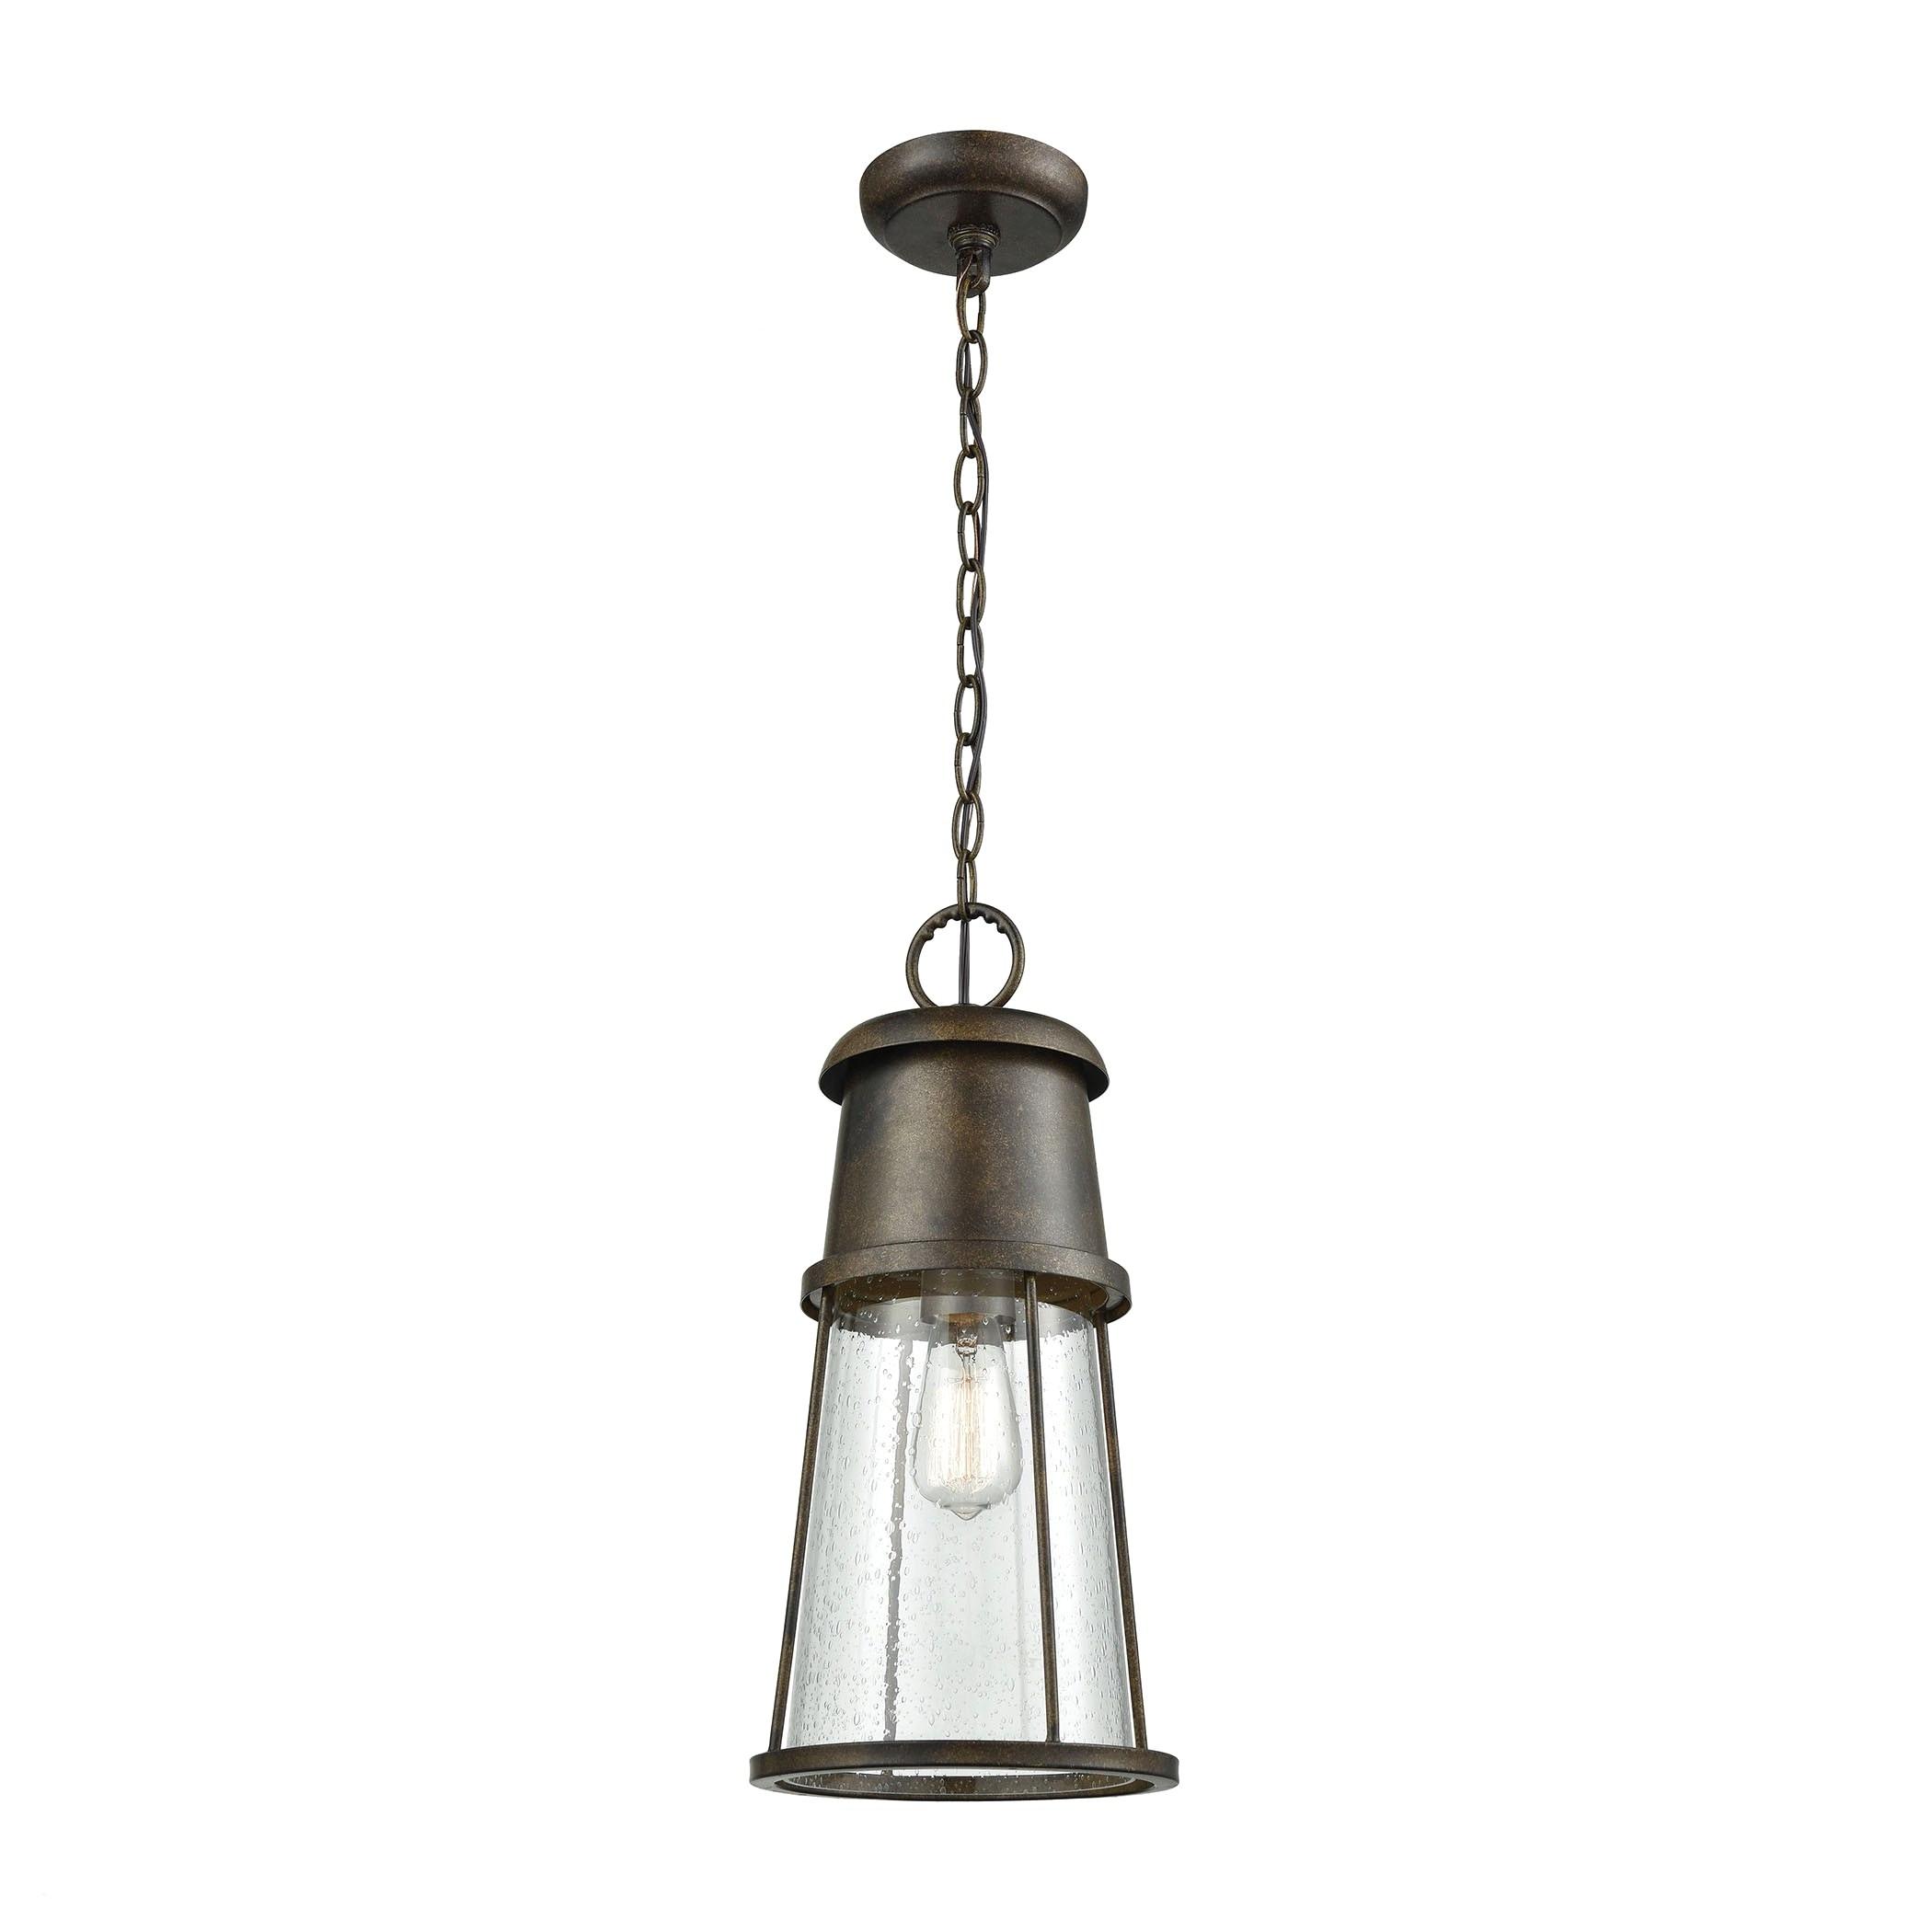 lights at lowes a· amazing kitchen design ideas using fresh pendant lightenards literalexposure plus inspiration of menards pendant